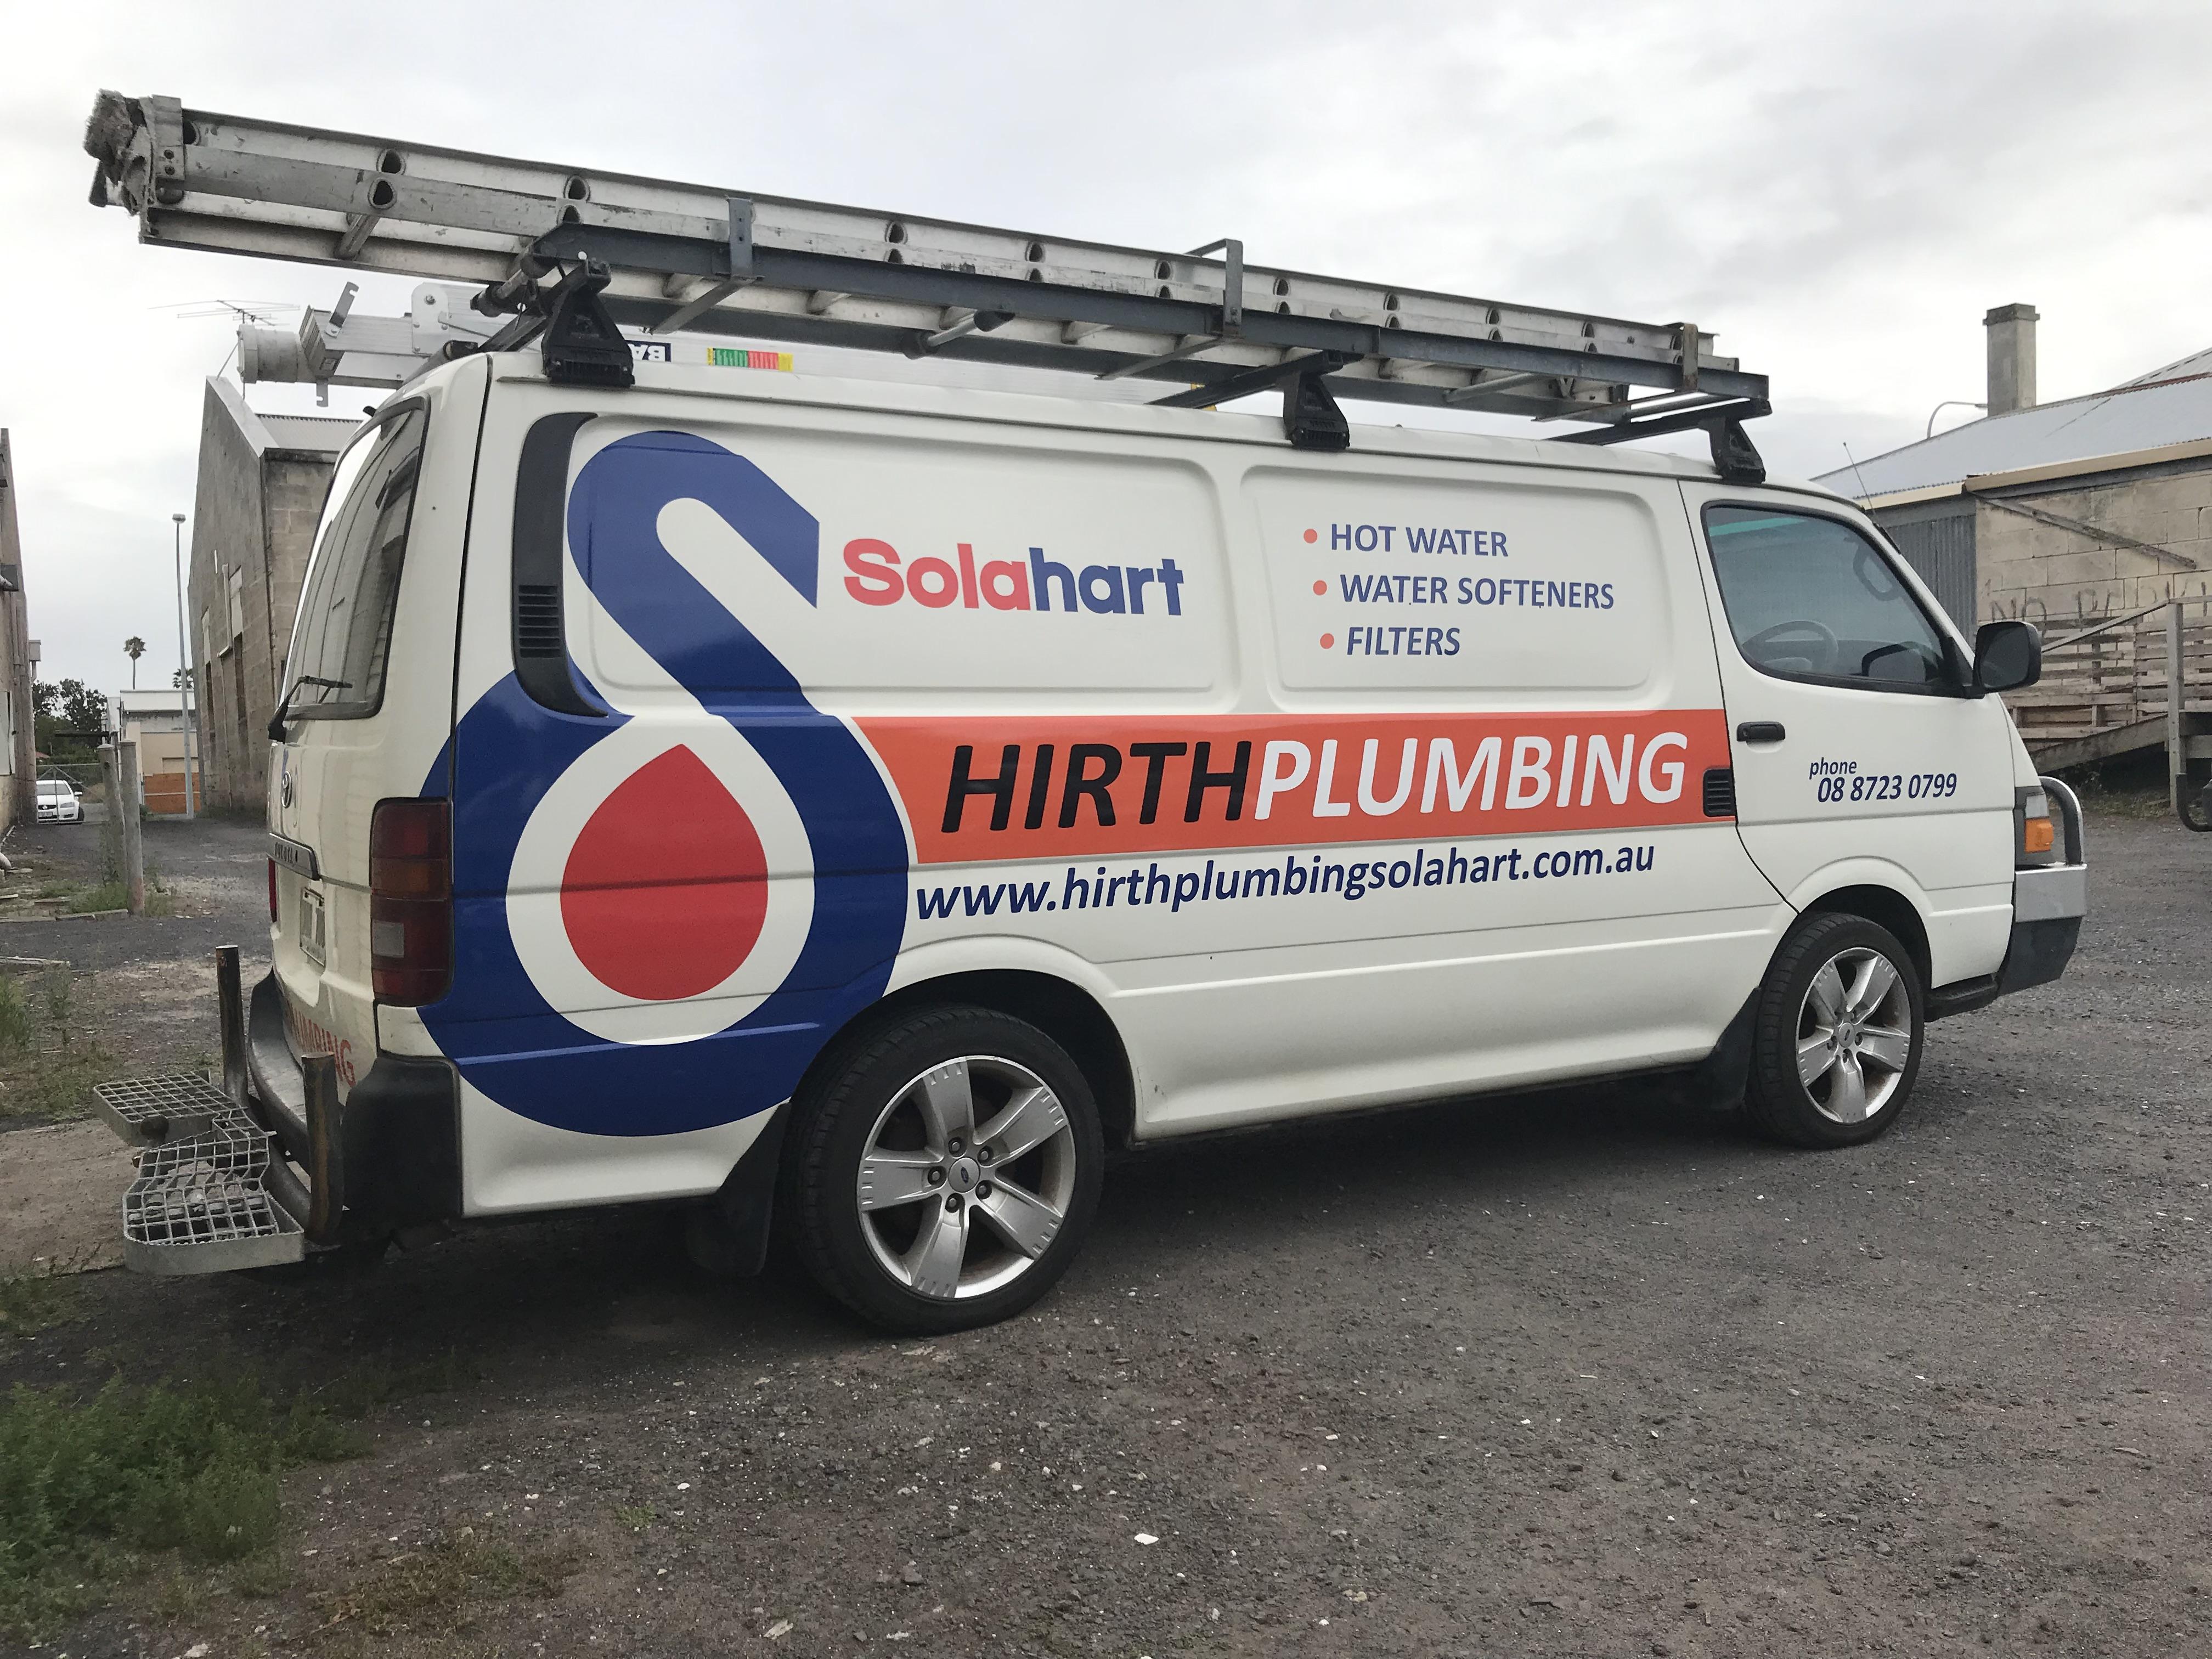 Hirth Plumbing Van Signage